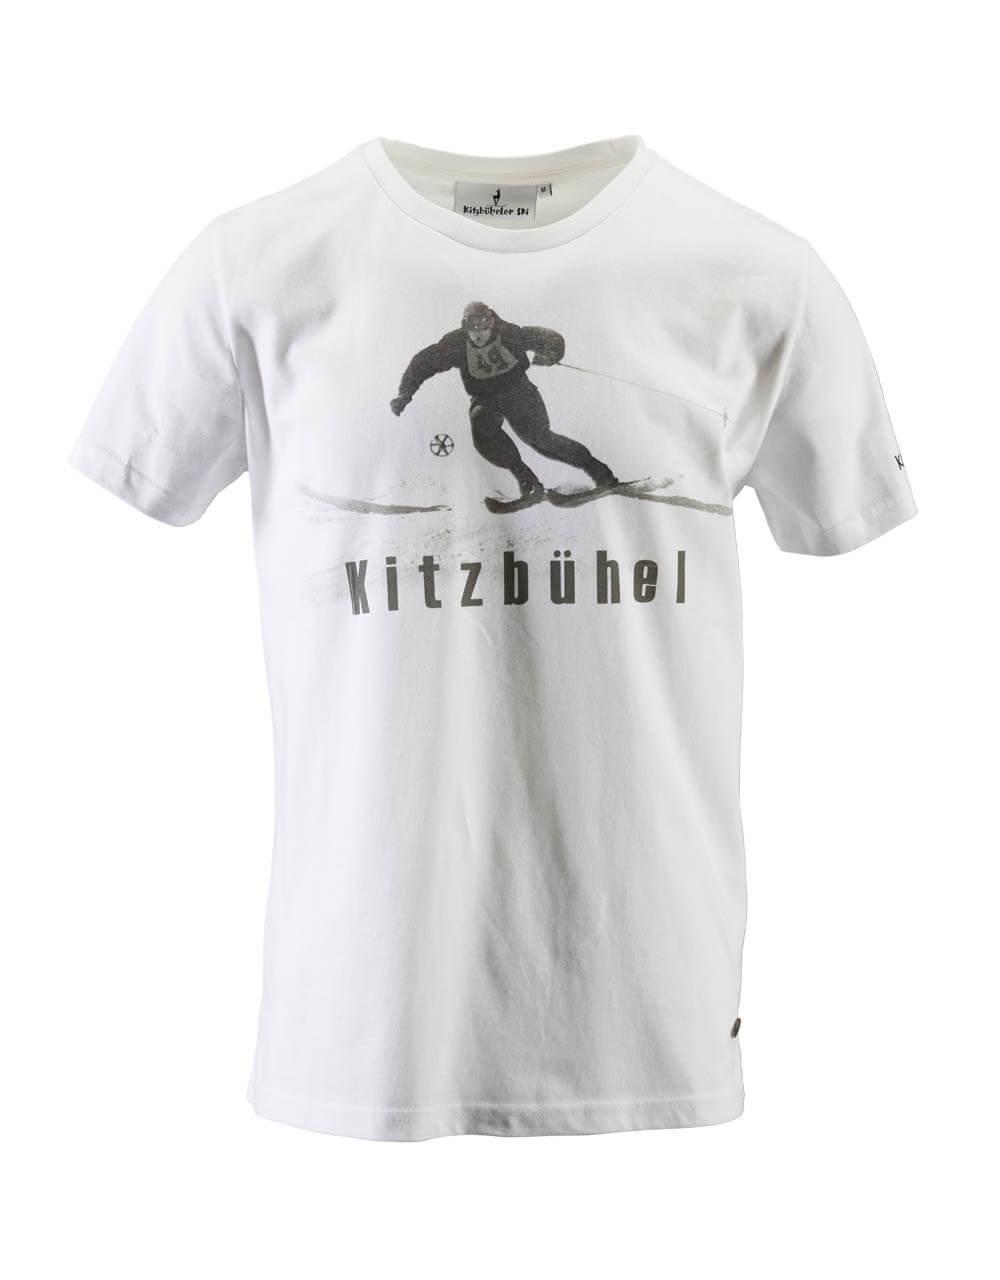 682650300 Herren T-Shirt weiß pepi